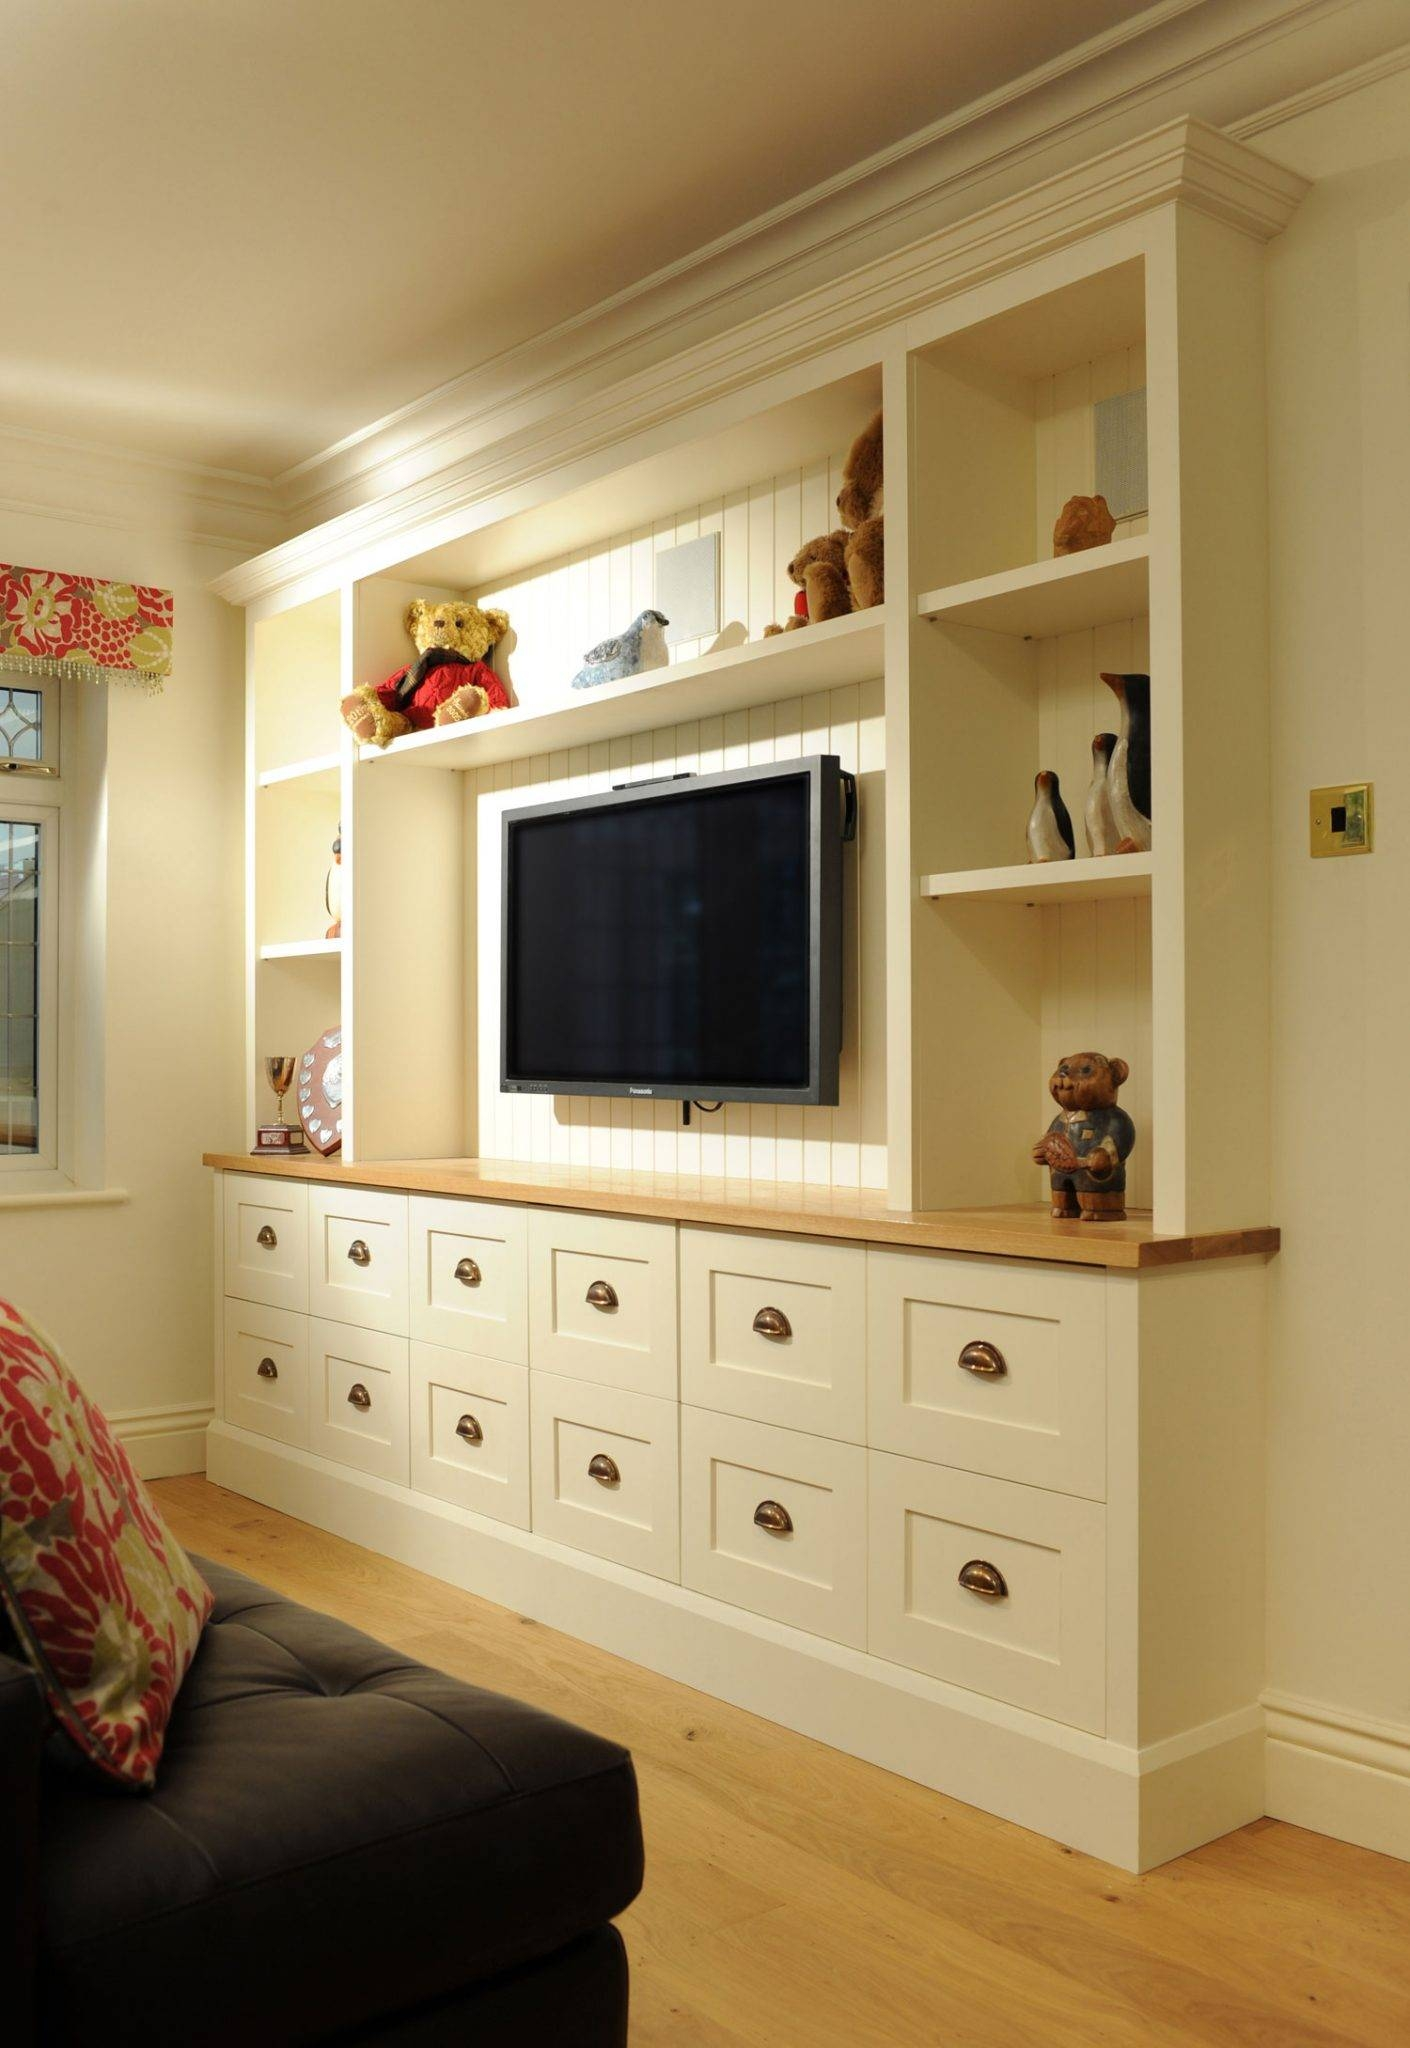 Bespoke Tv Units & Media Cabinets Custom Madehand – James Mayor Inside Bespoke Tv Cabinets (View 12 of 15)